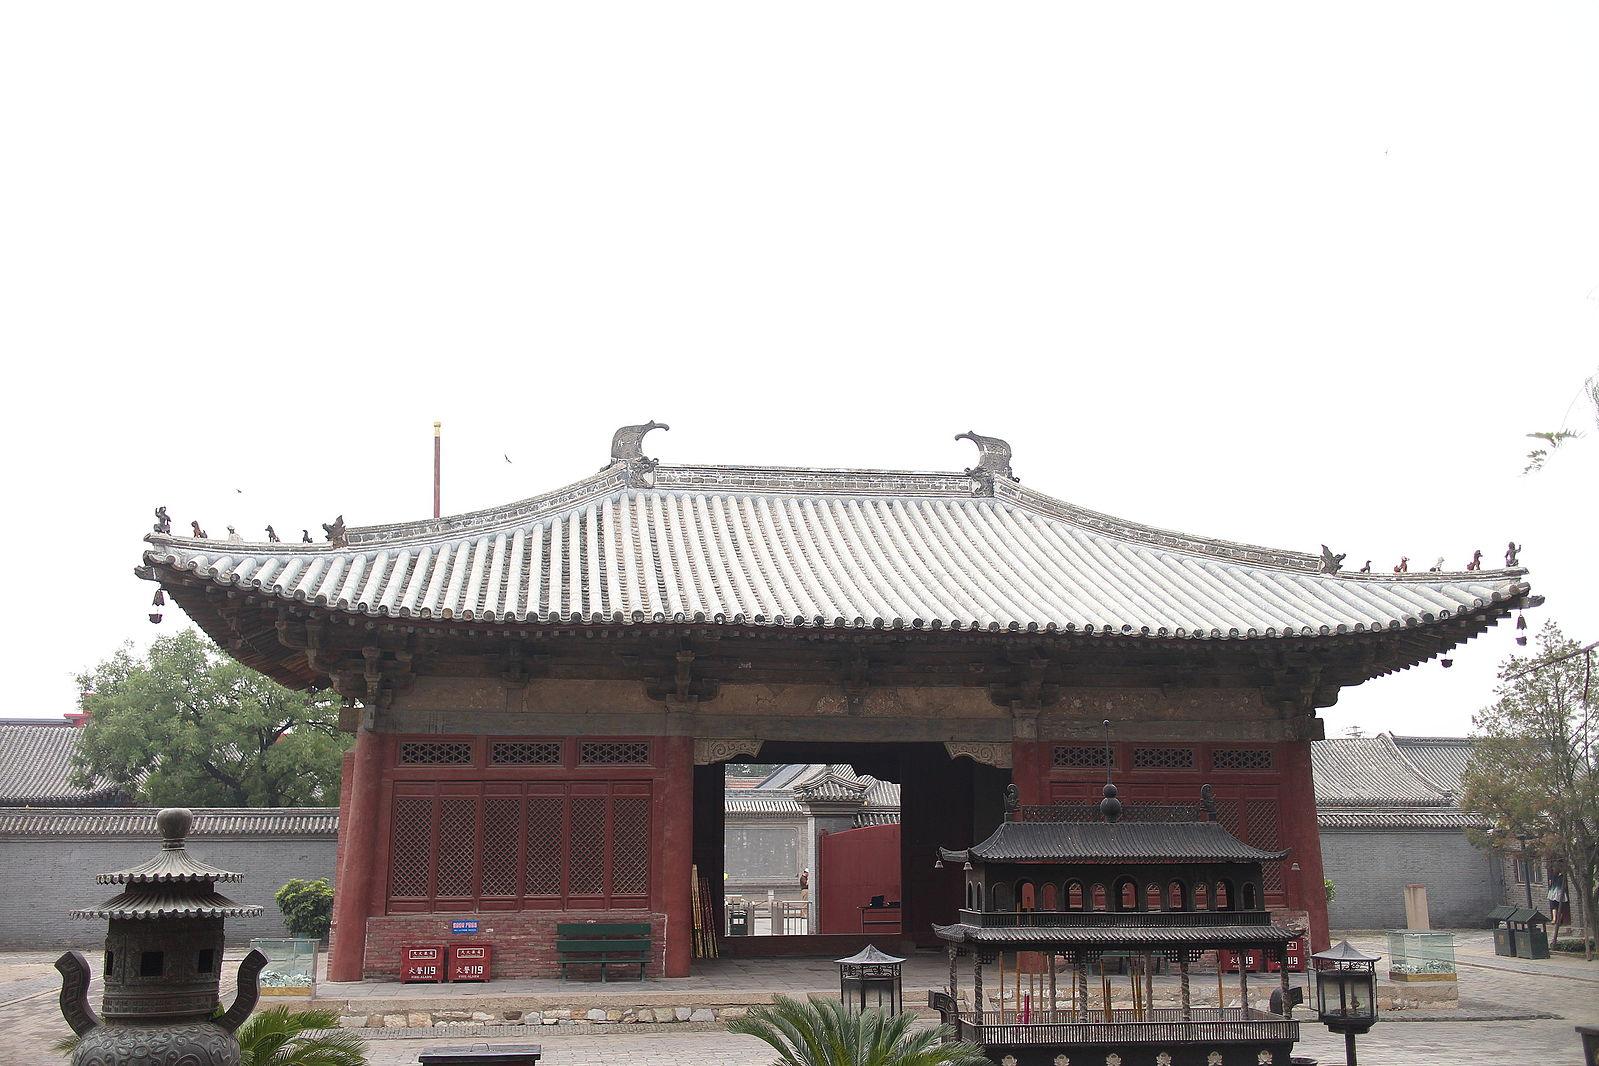 The Shan Gate of the Dule Temple. (Image: Xin via Wikimedia CC BY-SA 4.0)